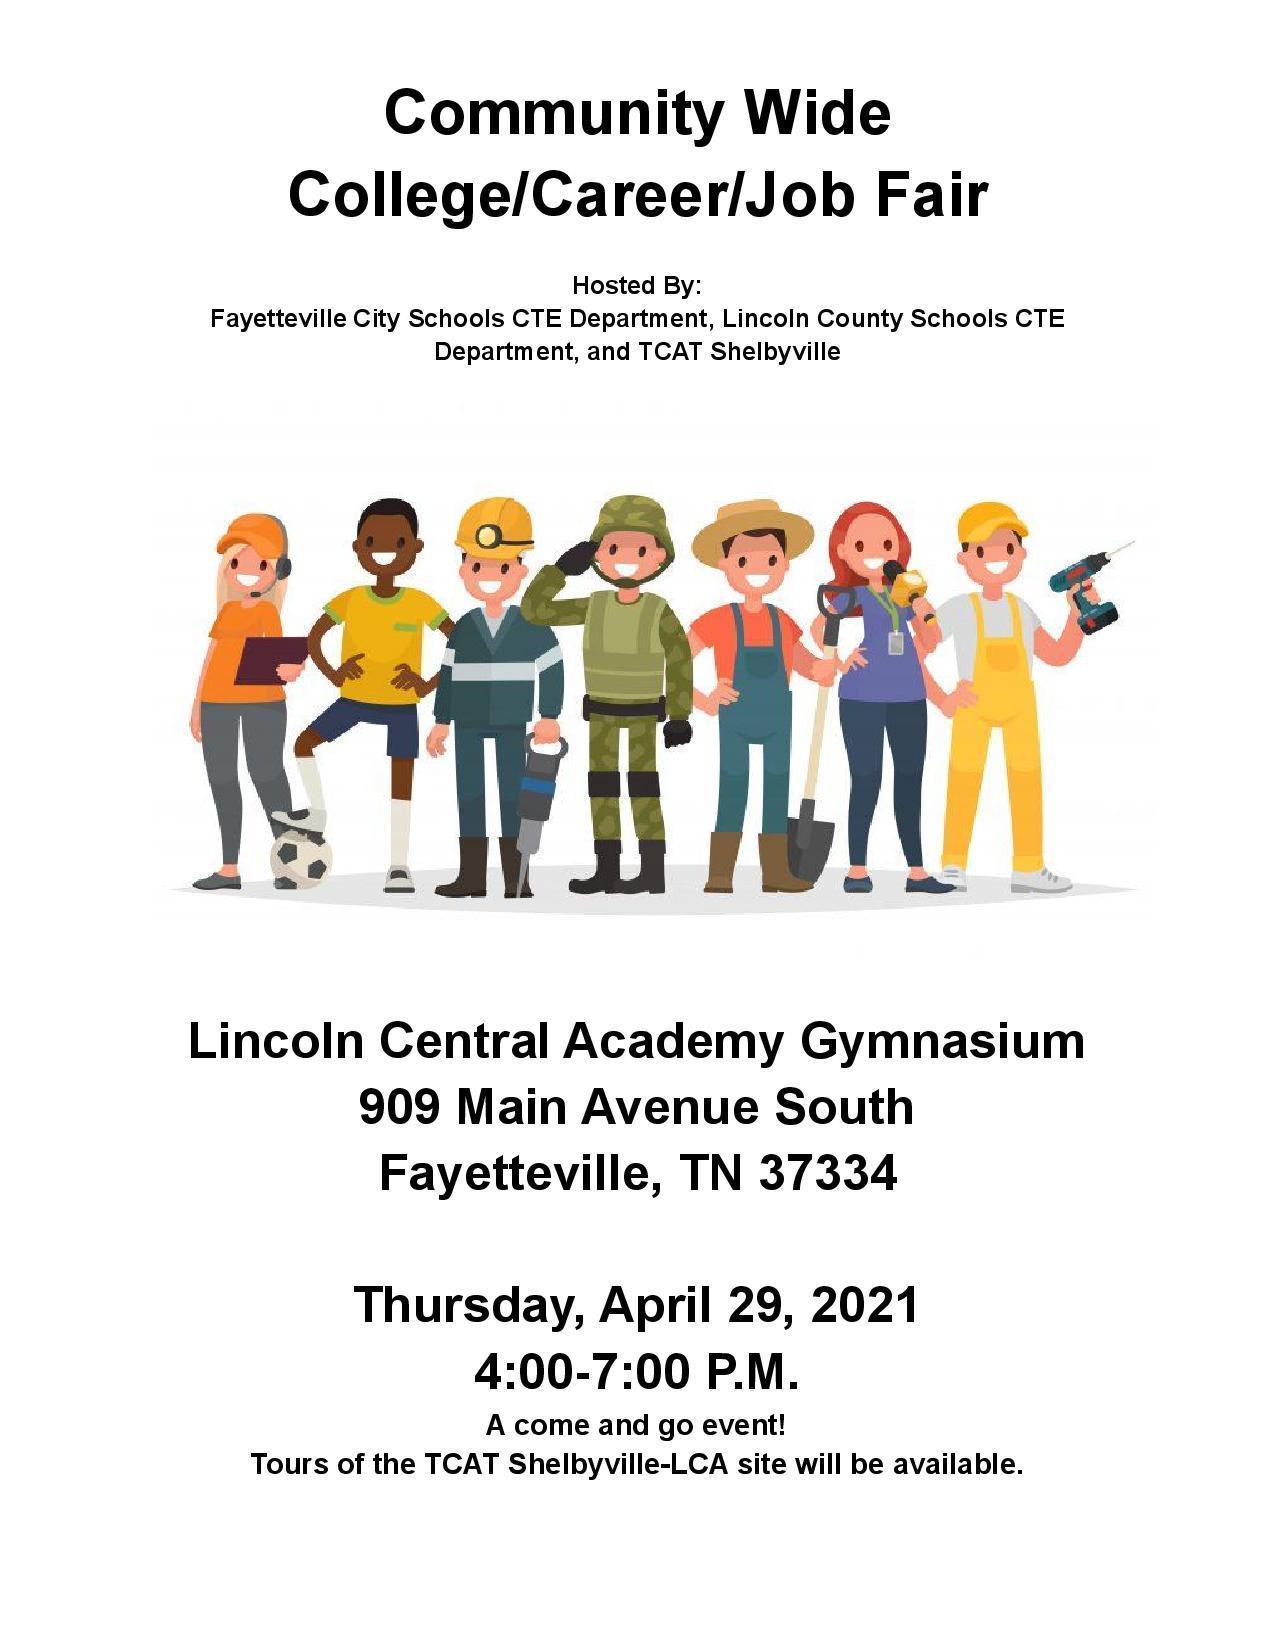 Community Wide College & Career Fair April 29, 2021